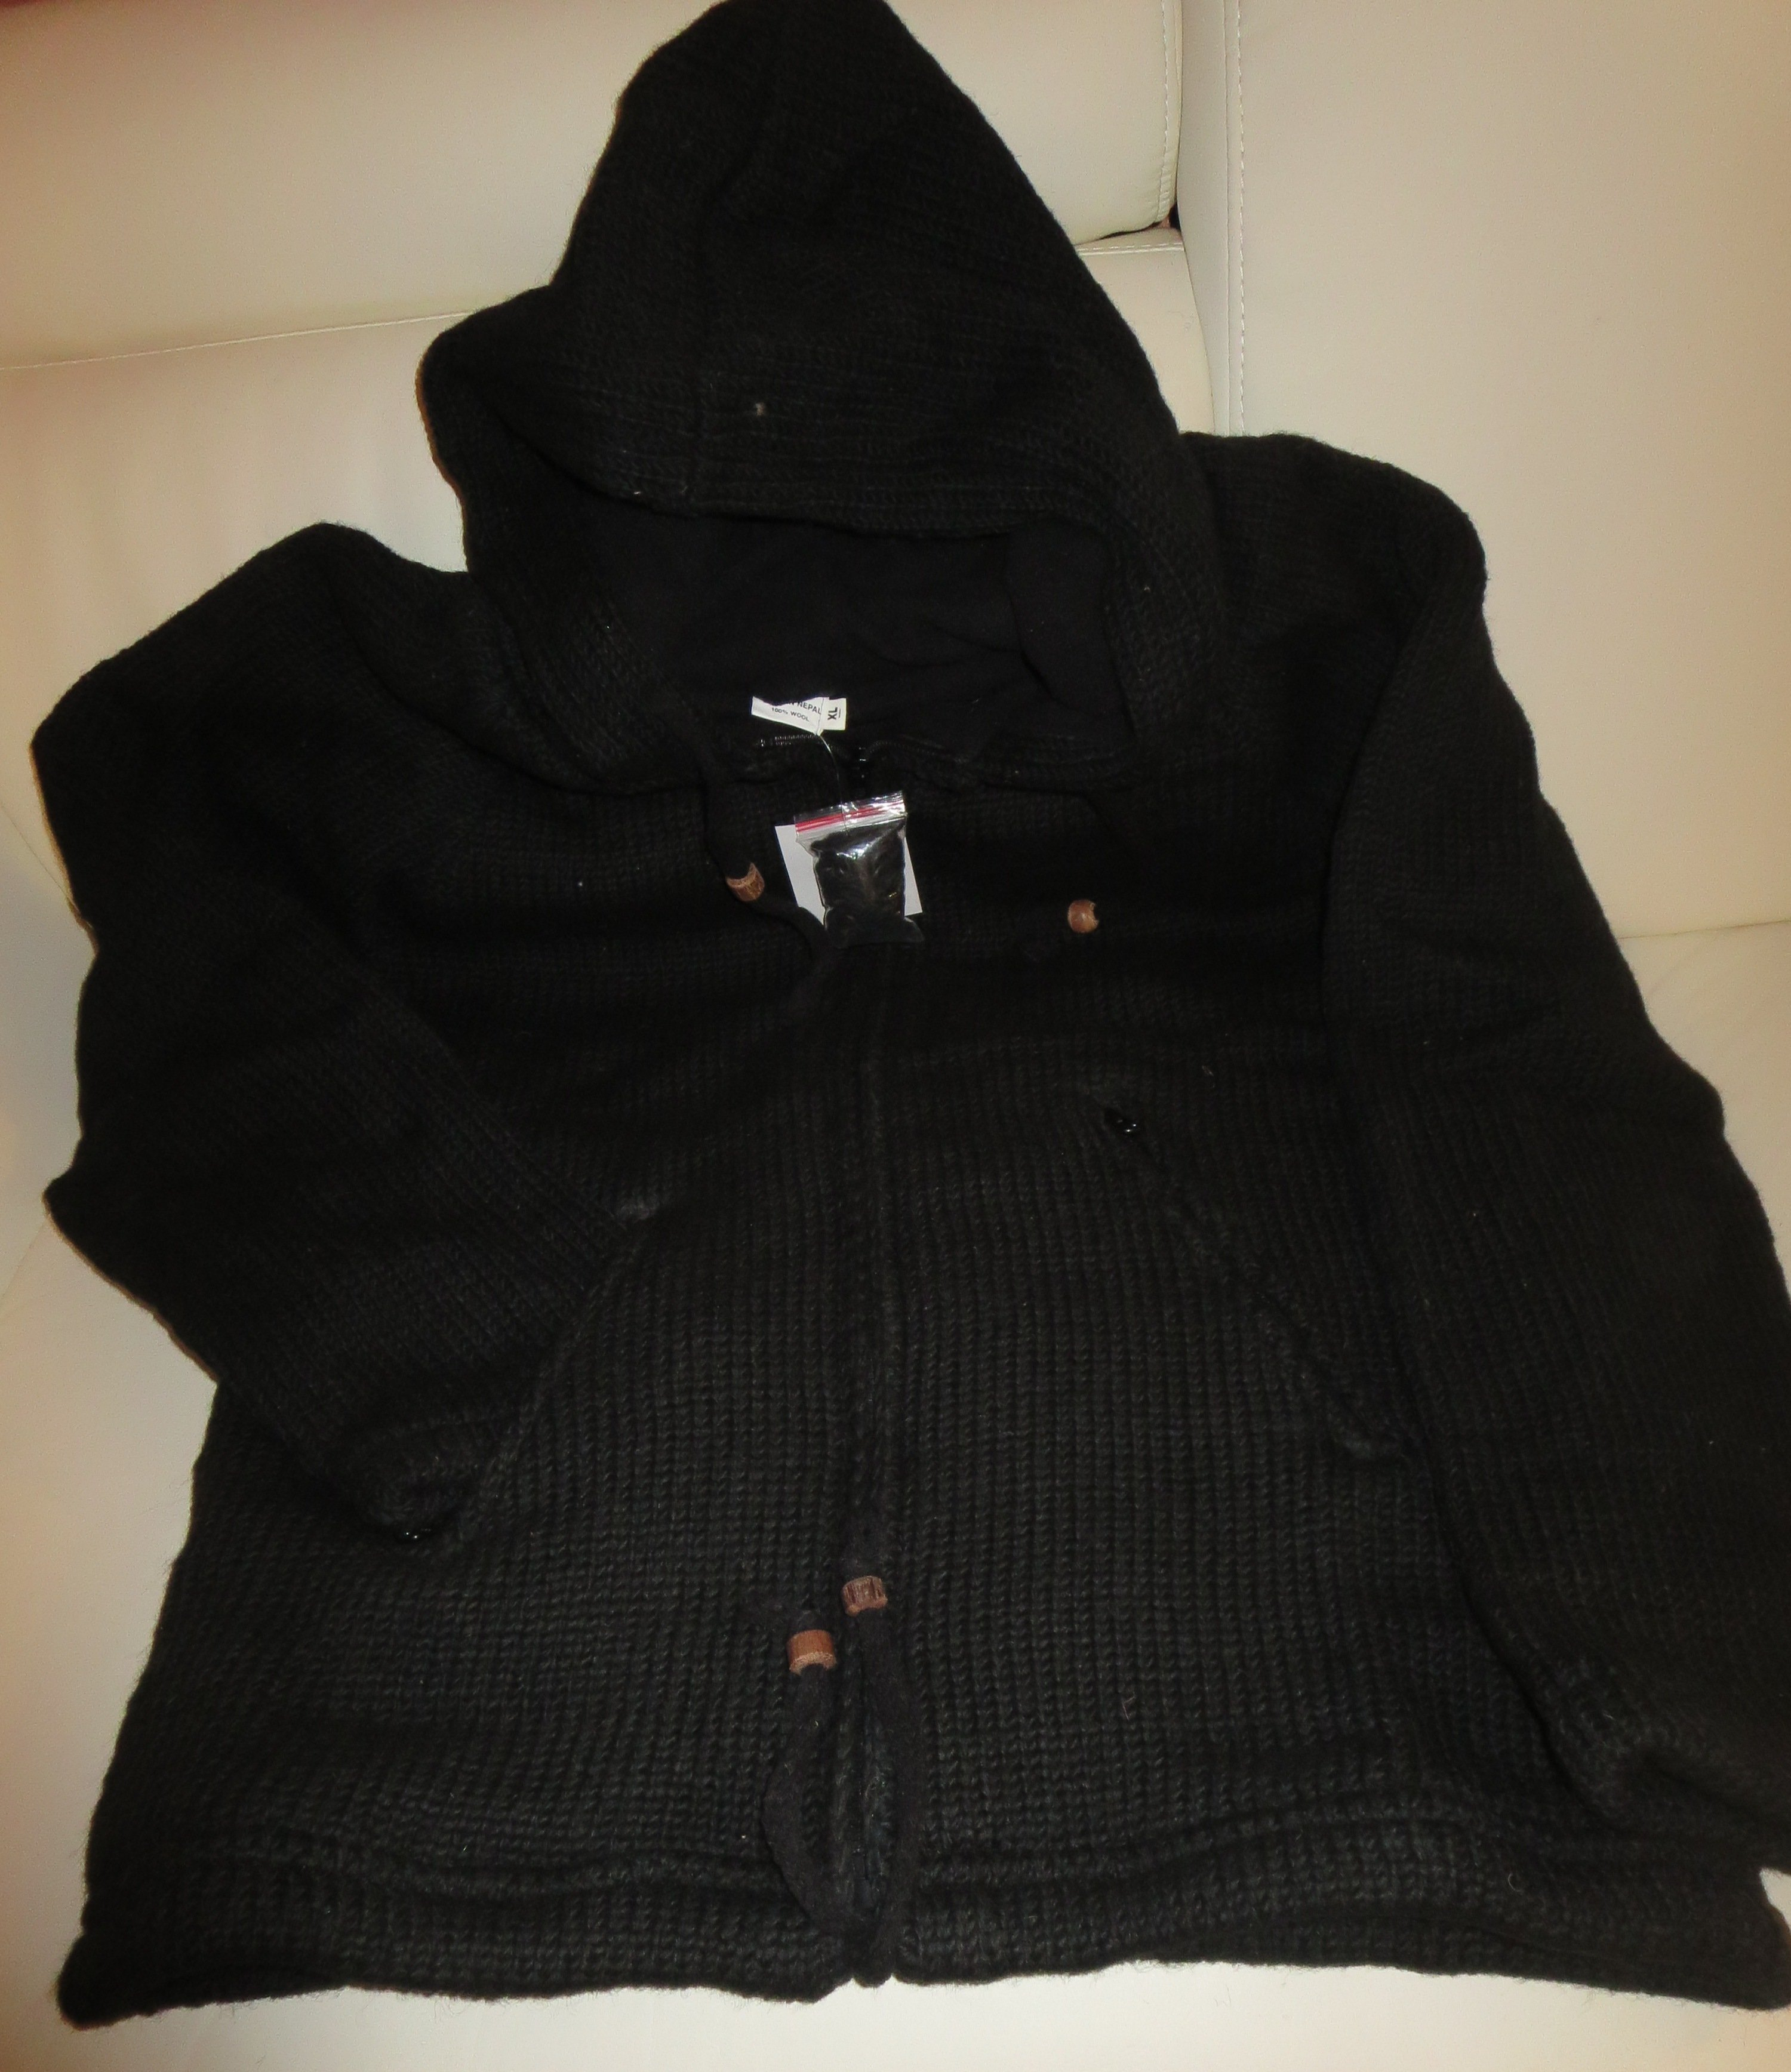 Woolen Jacket Hand Knitted 0784